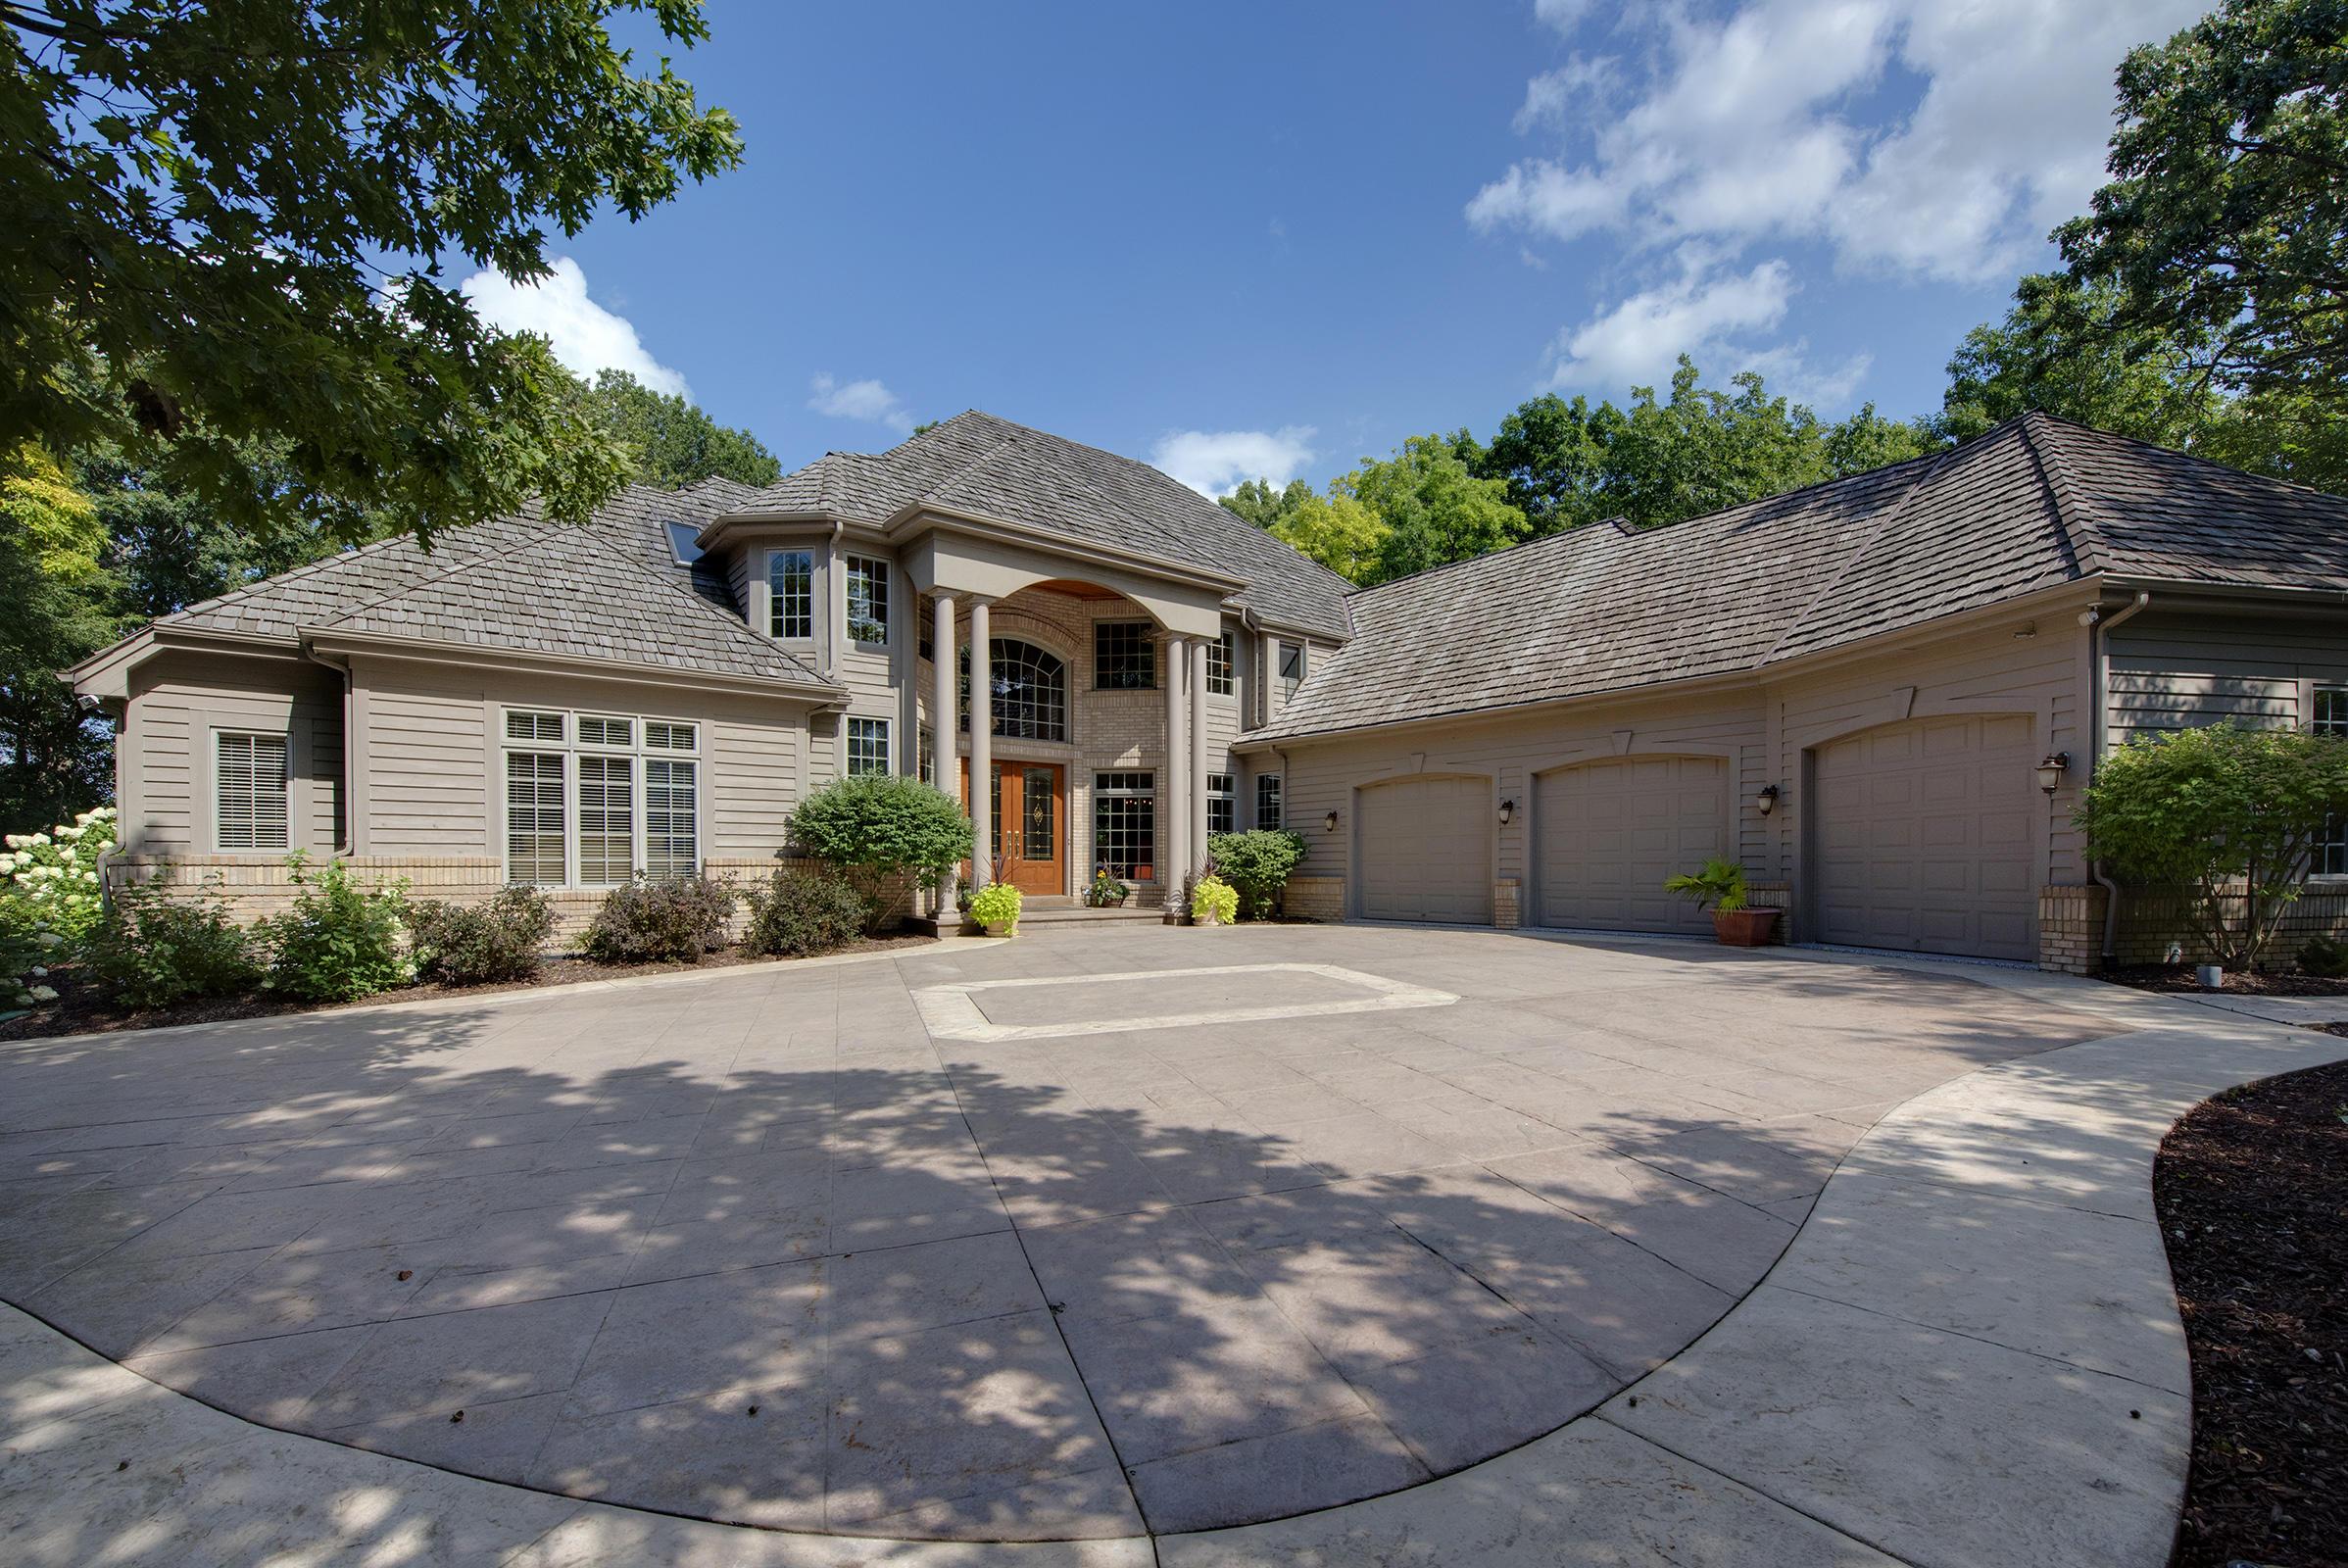 W309N1810 Greywood Ln, Delafield, Wisconsin 53018, 4 Bedrooms Bedrooms, 14 Rooms Rooms,5 BathroomsBathrooms,Single-Family,For Sale,Greywood Ln,1751454